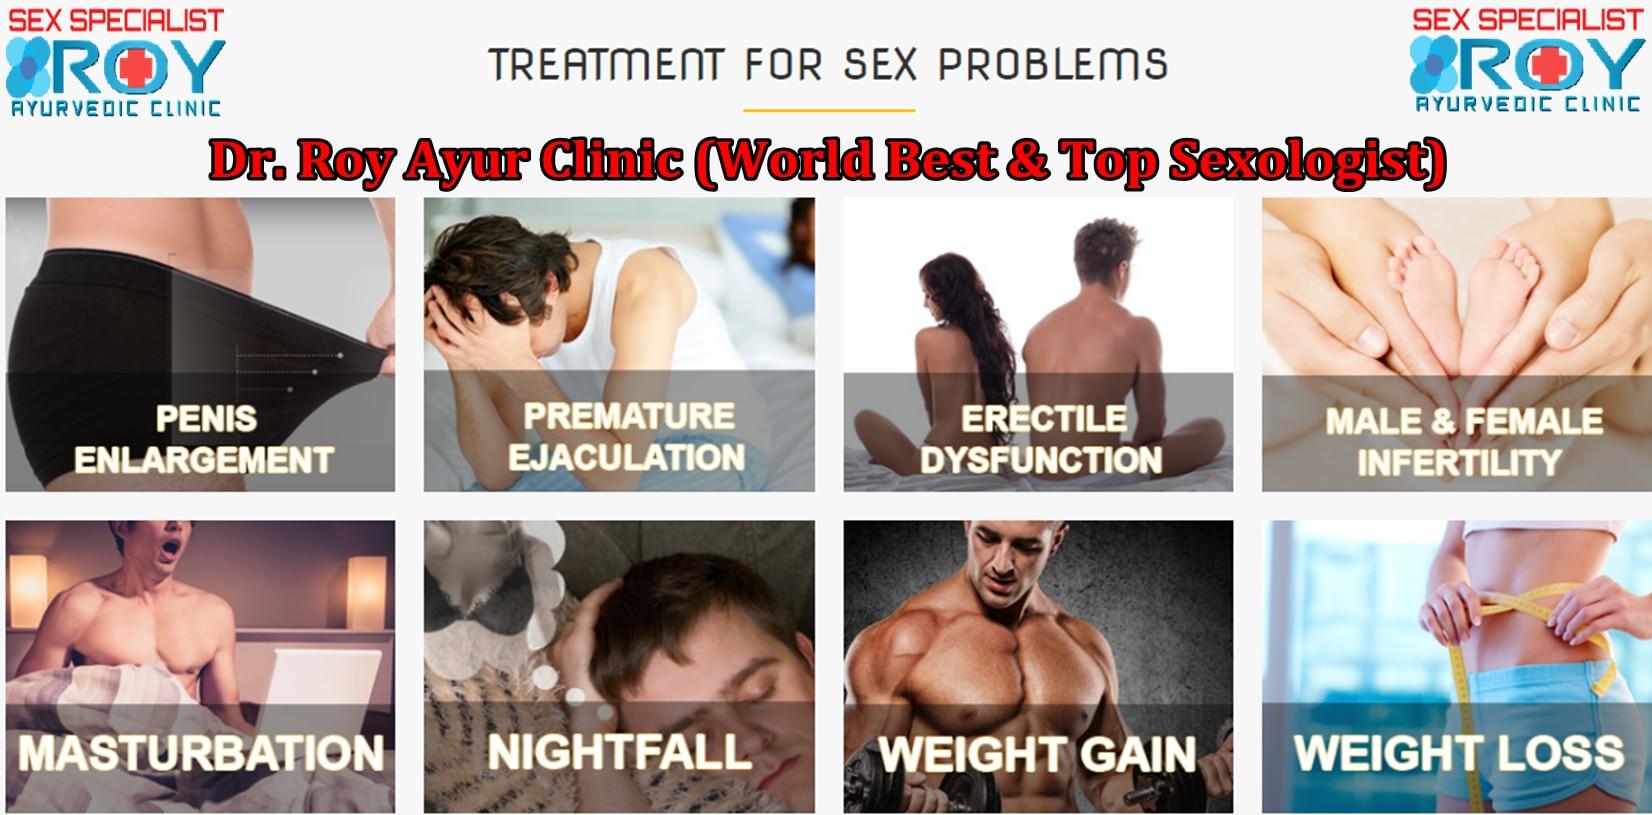 Dr. Roy World Top Sexologist # 98381 98529